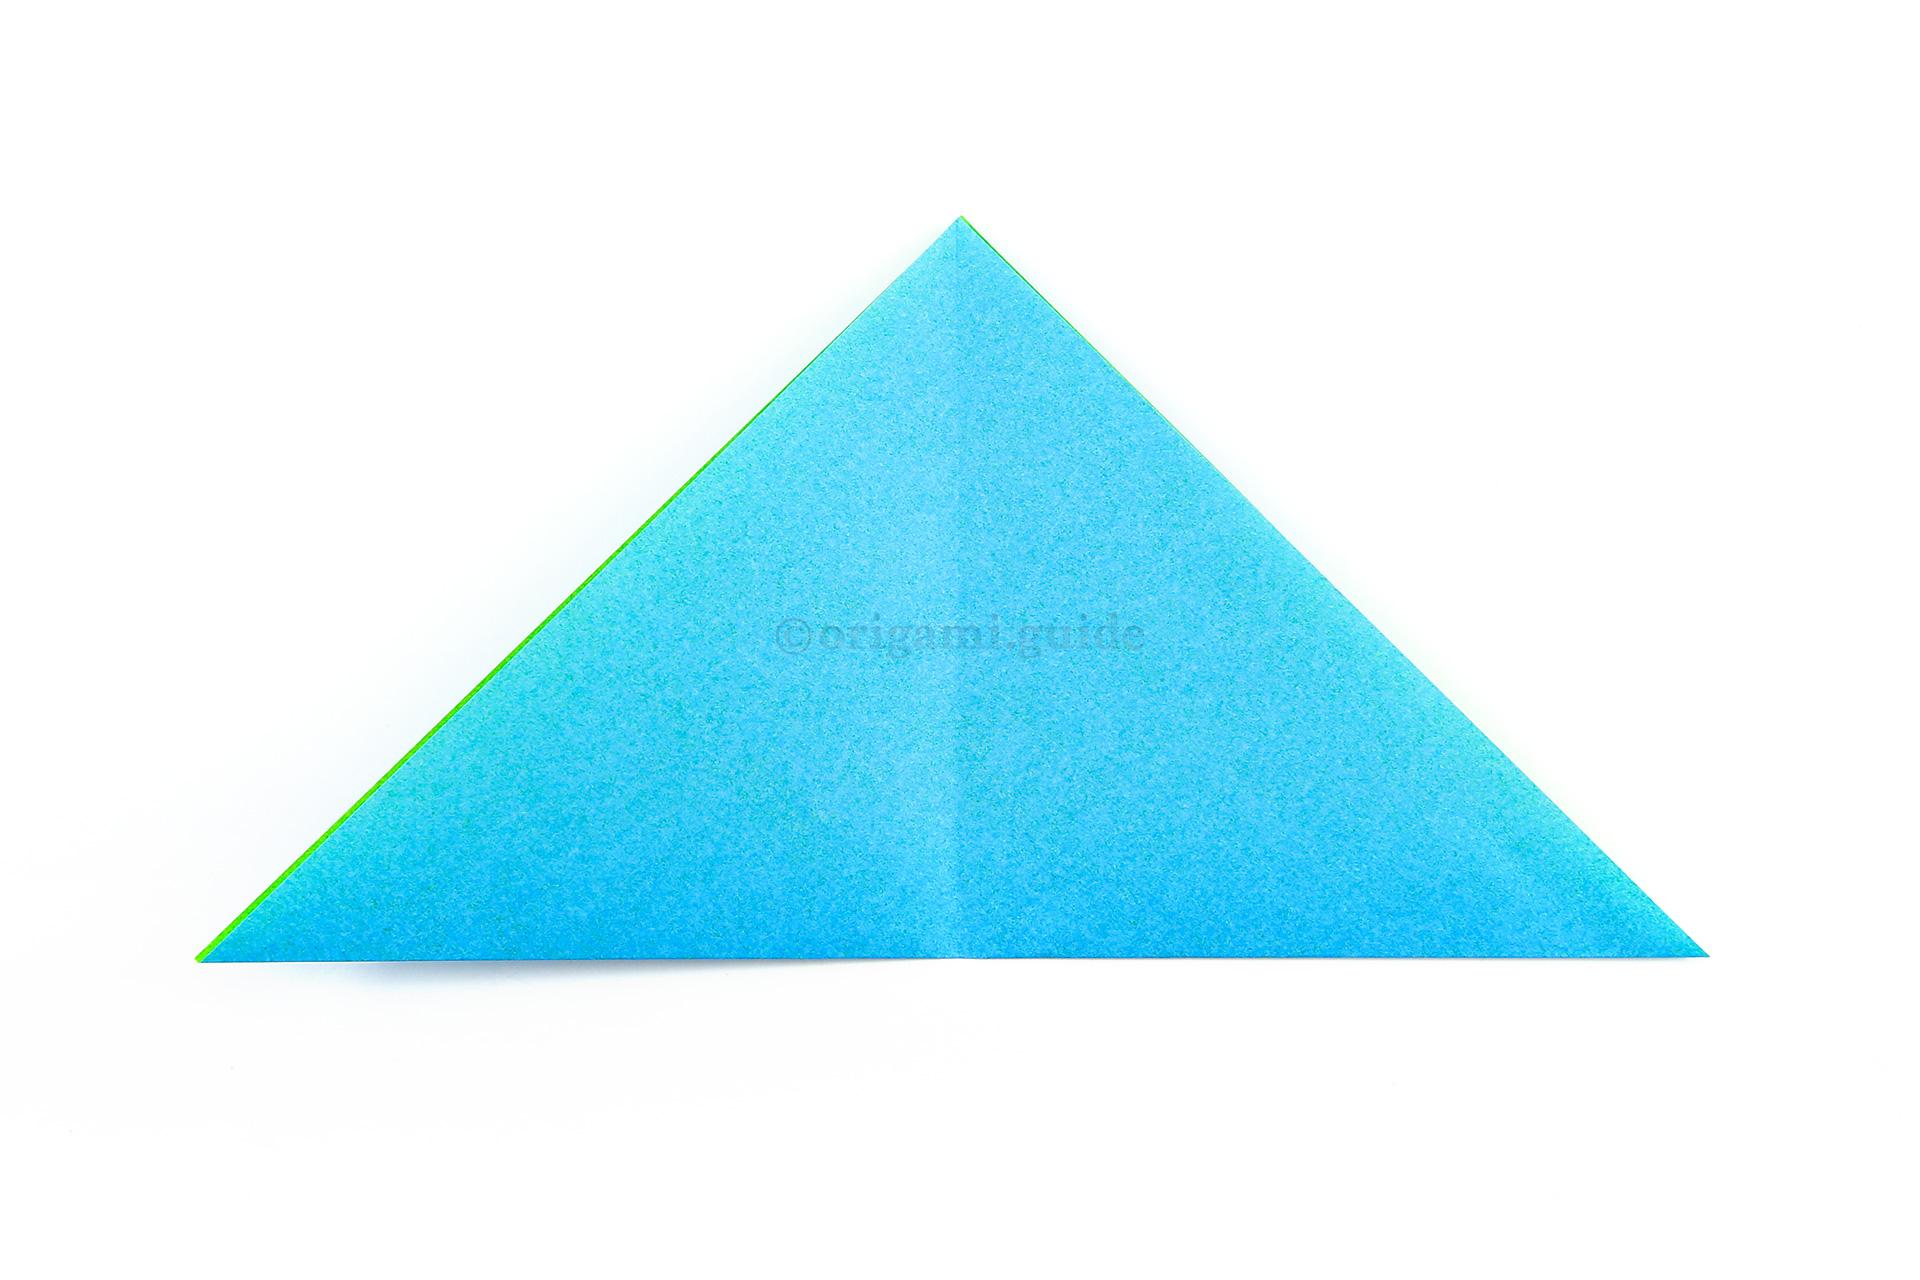 Simple Origami Dove | Madarak, Húsvéti tojás | 1280x1920